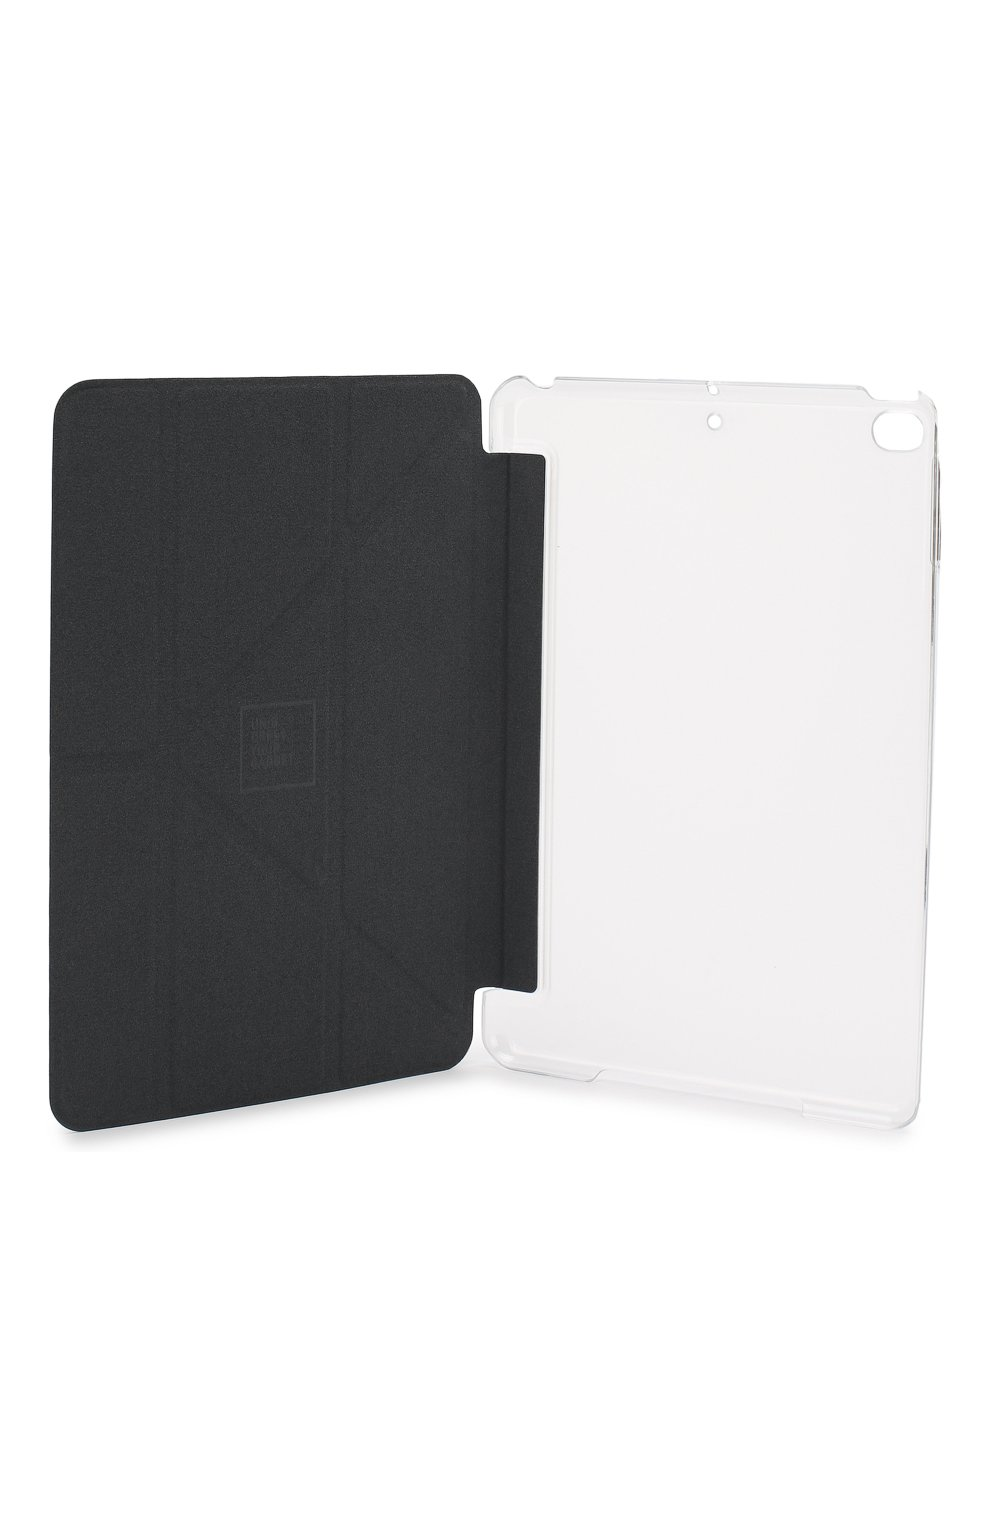 Мужской чехол для ipad mini 5 UNIQ серого цвета, арт. PDM5YKR-KNVGRY   Фото 3